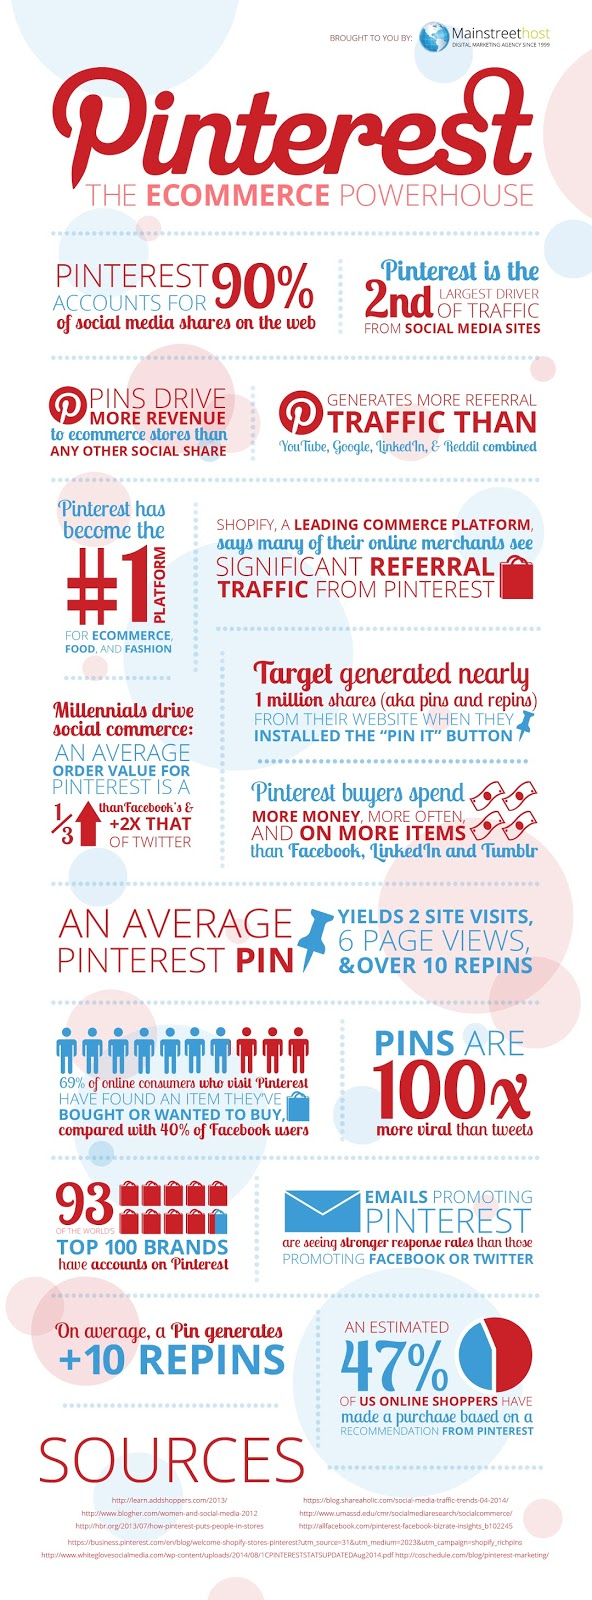 guncel-pinterest-istatistikleri-infografik